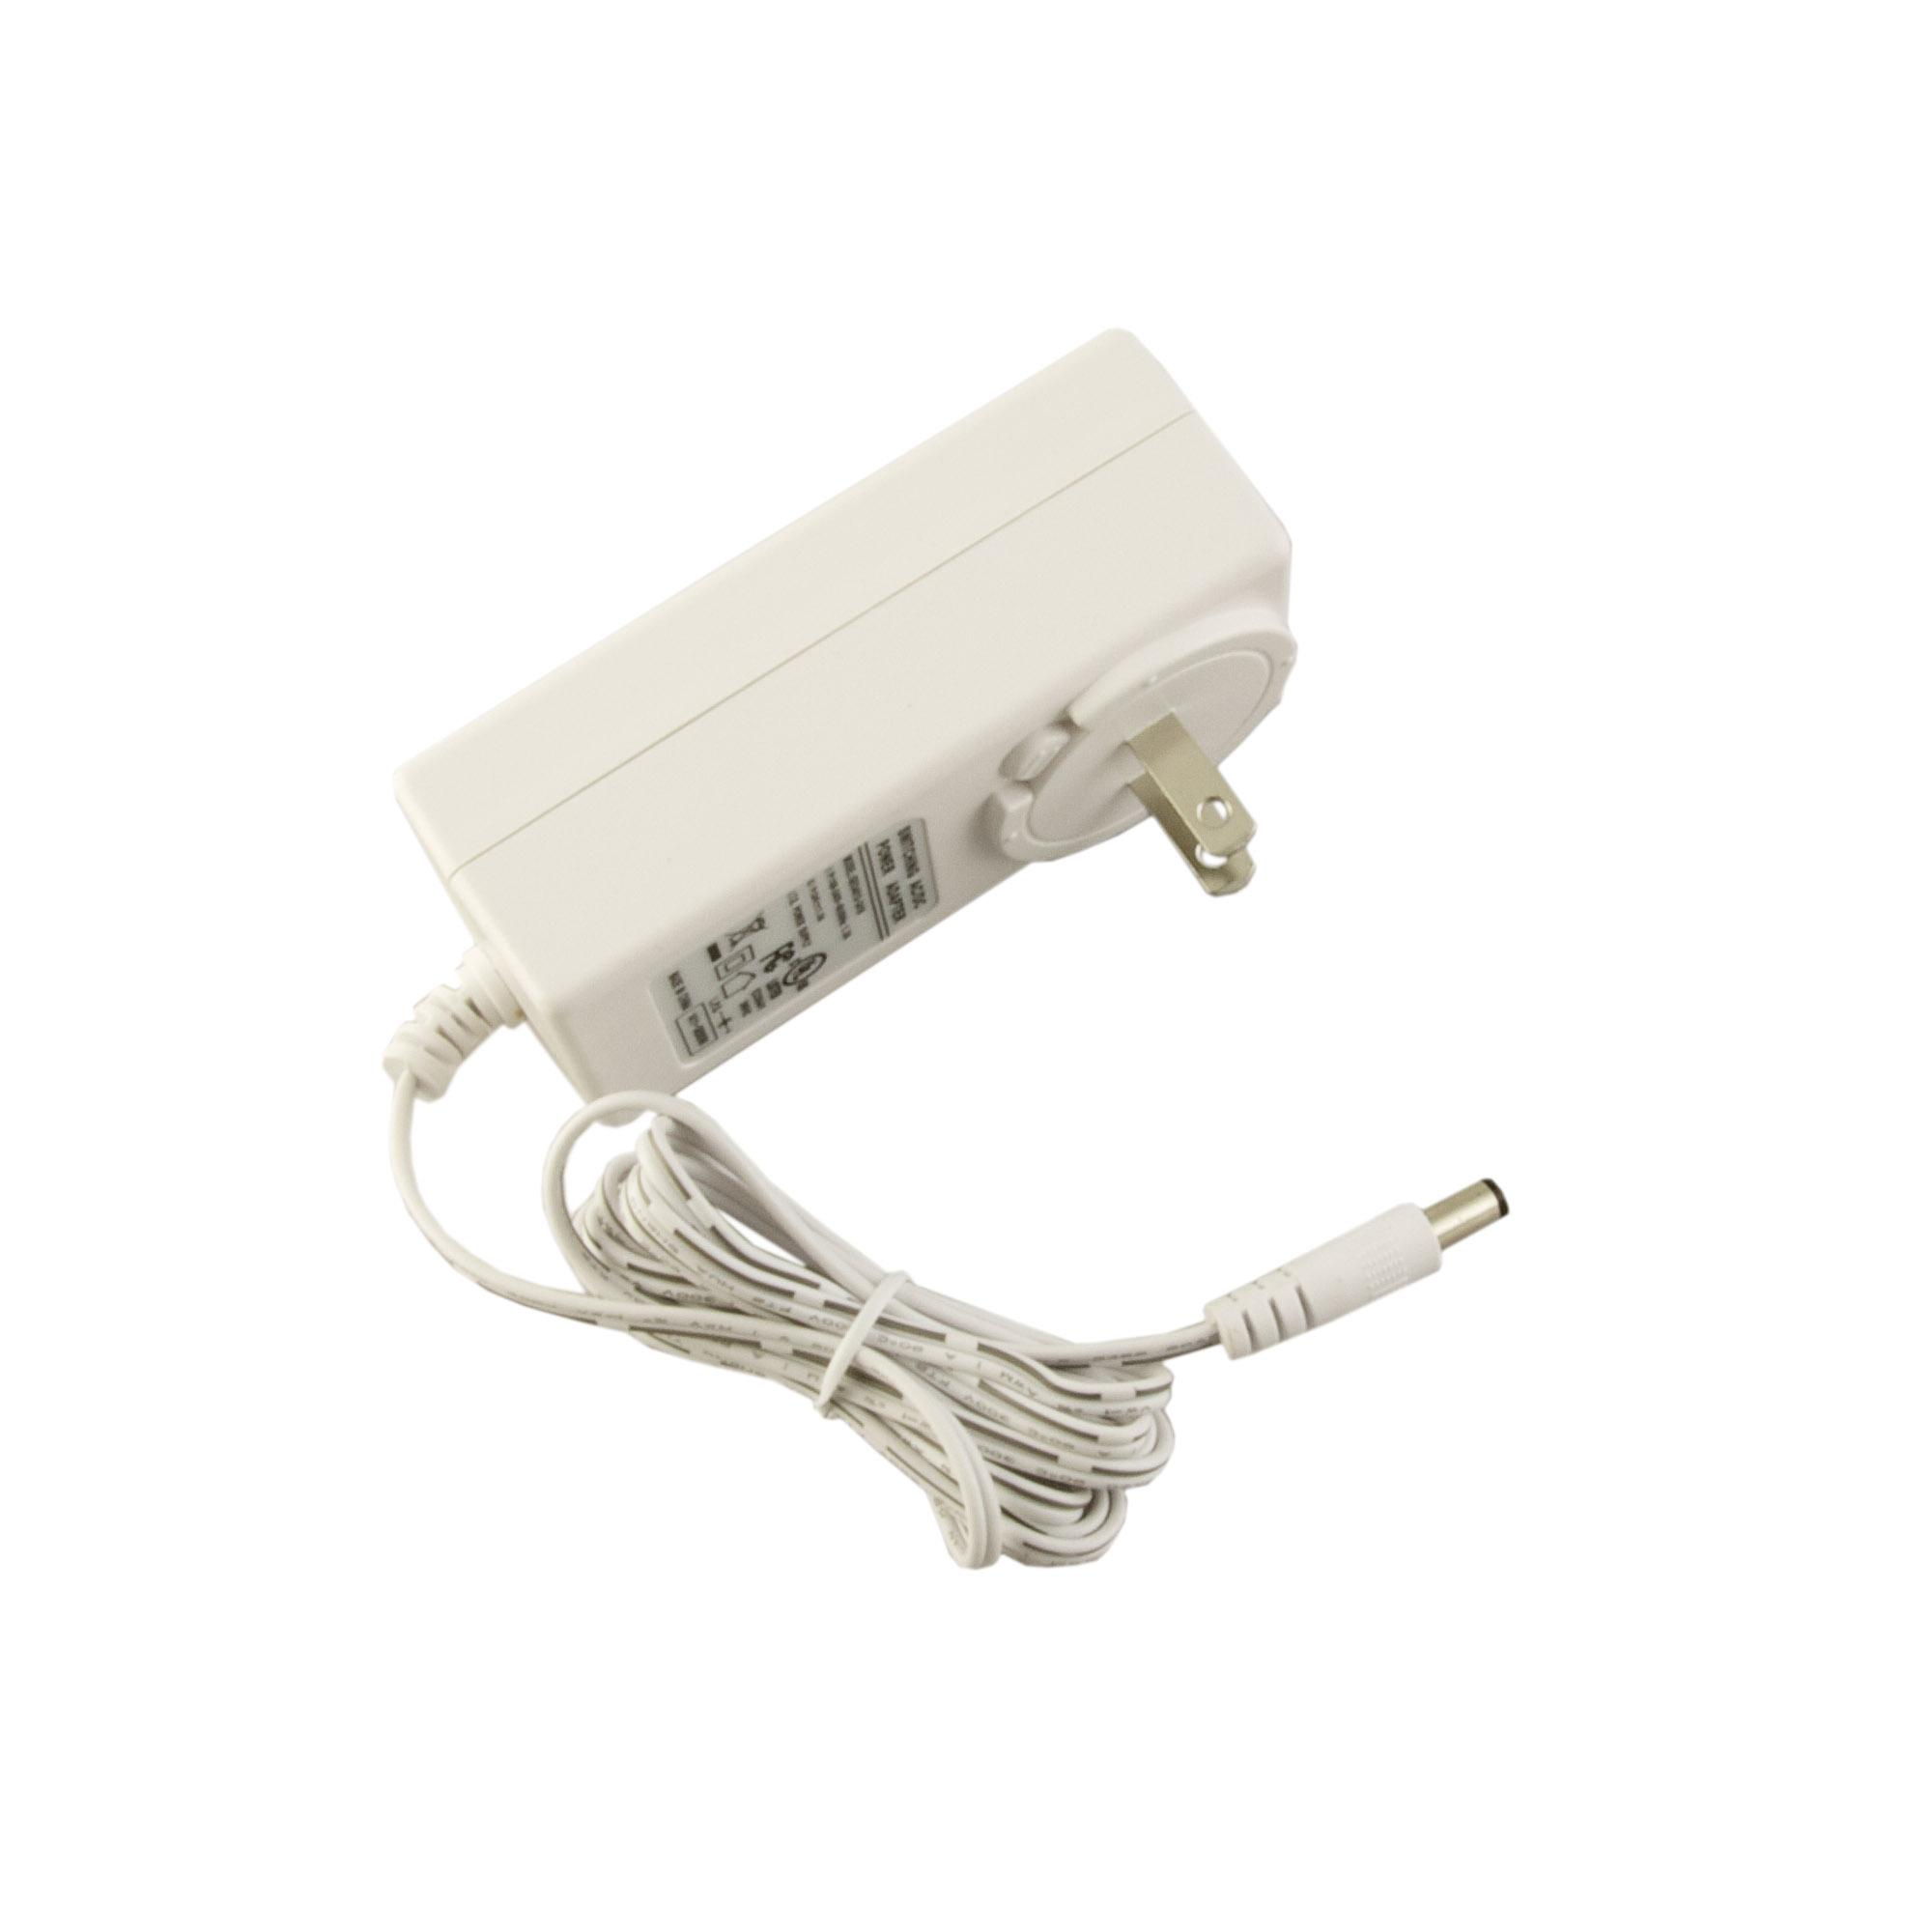 Blaze 12v Wet Location Led Strip: Plug-and-Play LED Power Supplies